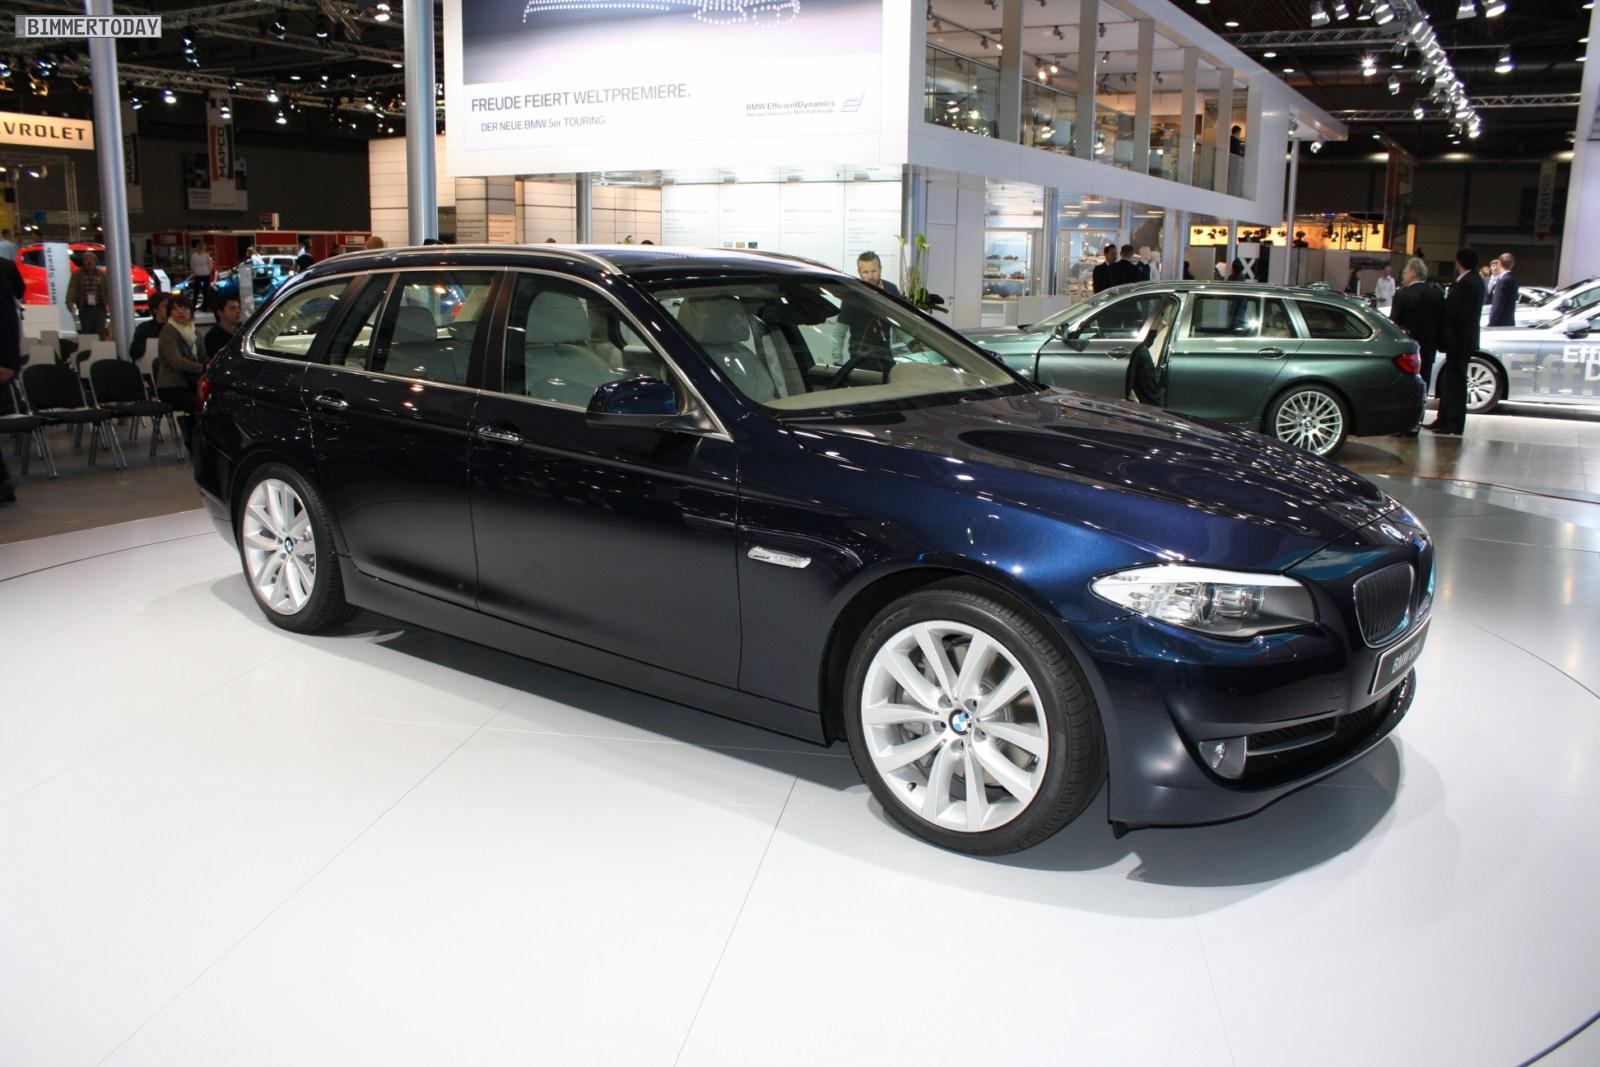 AMI 2010: Der BMW 5er Touring F11 in Imperialblau Metallic